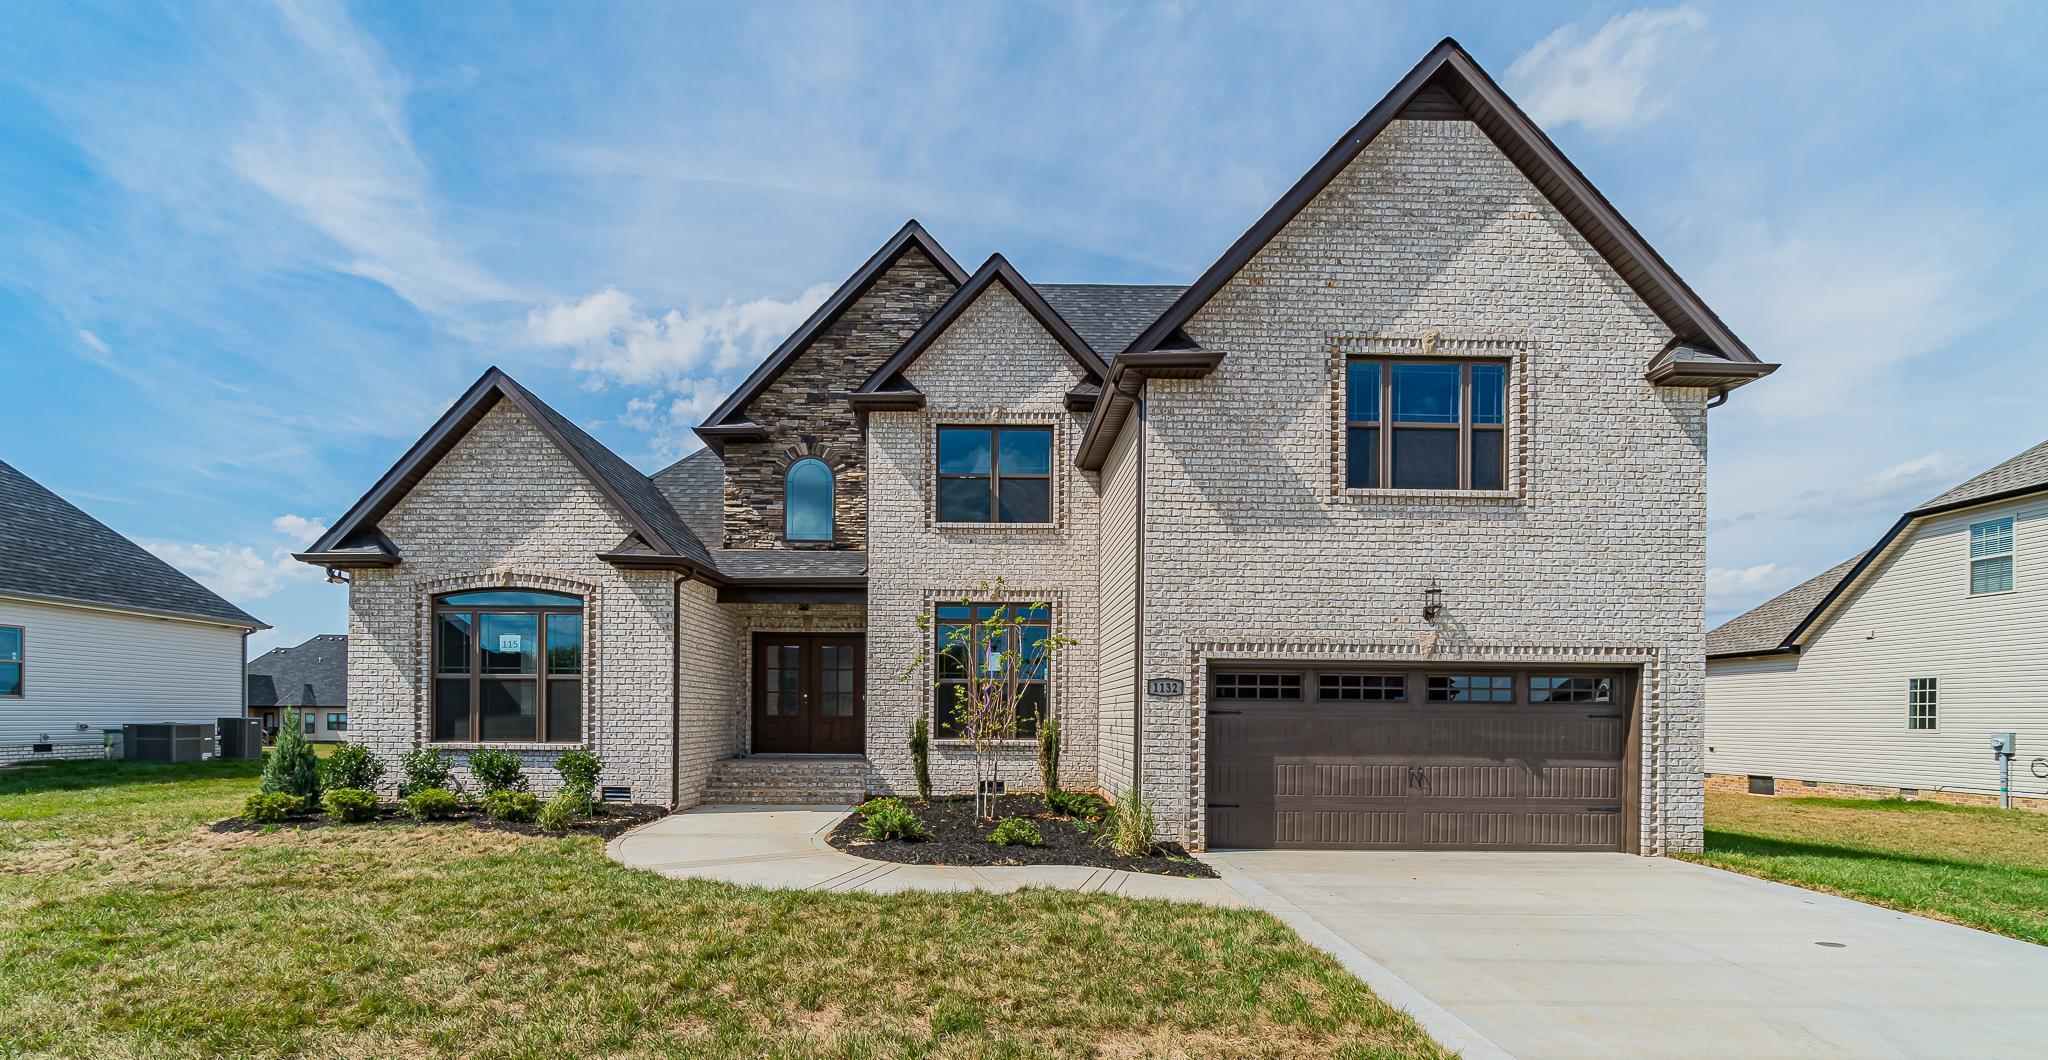 6216 Blacksmith Dr, Pleasant View, TN 37146 - Pleasant View, TN real estate listing